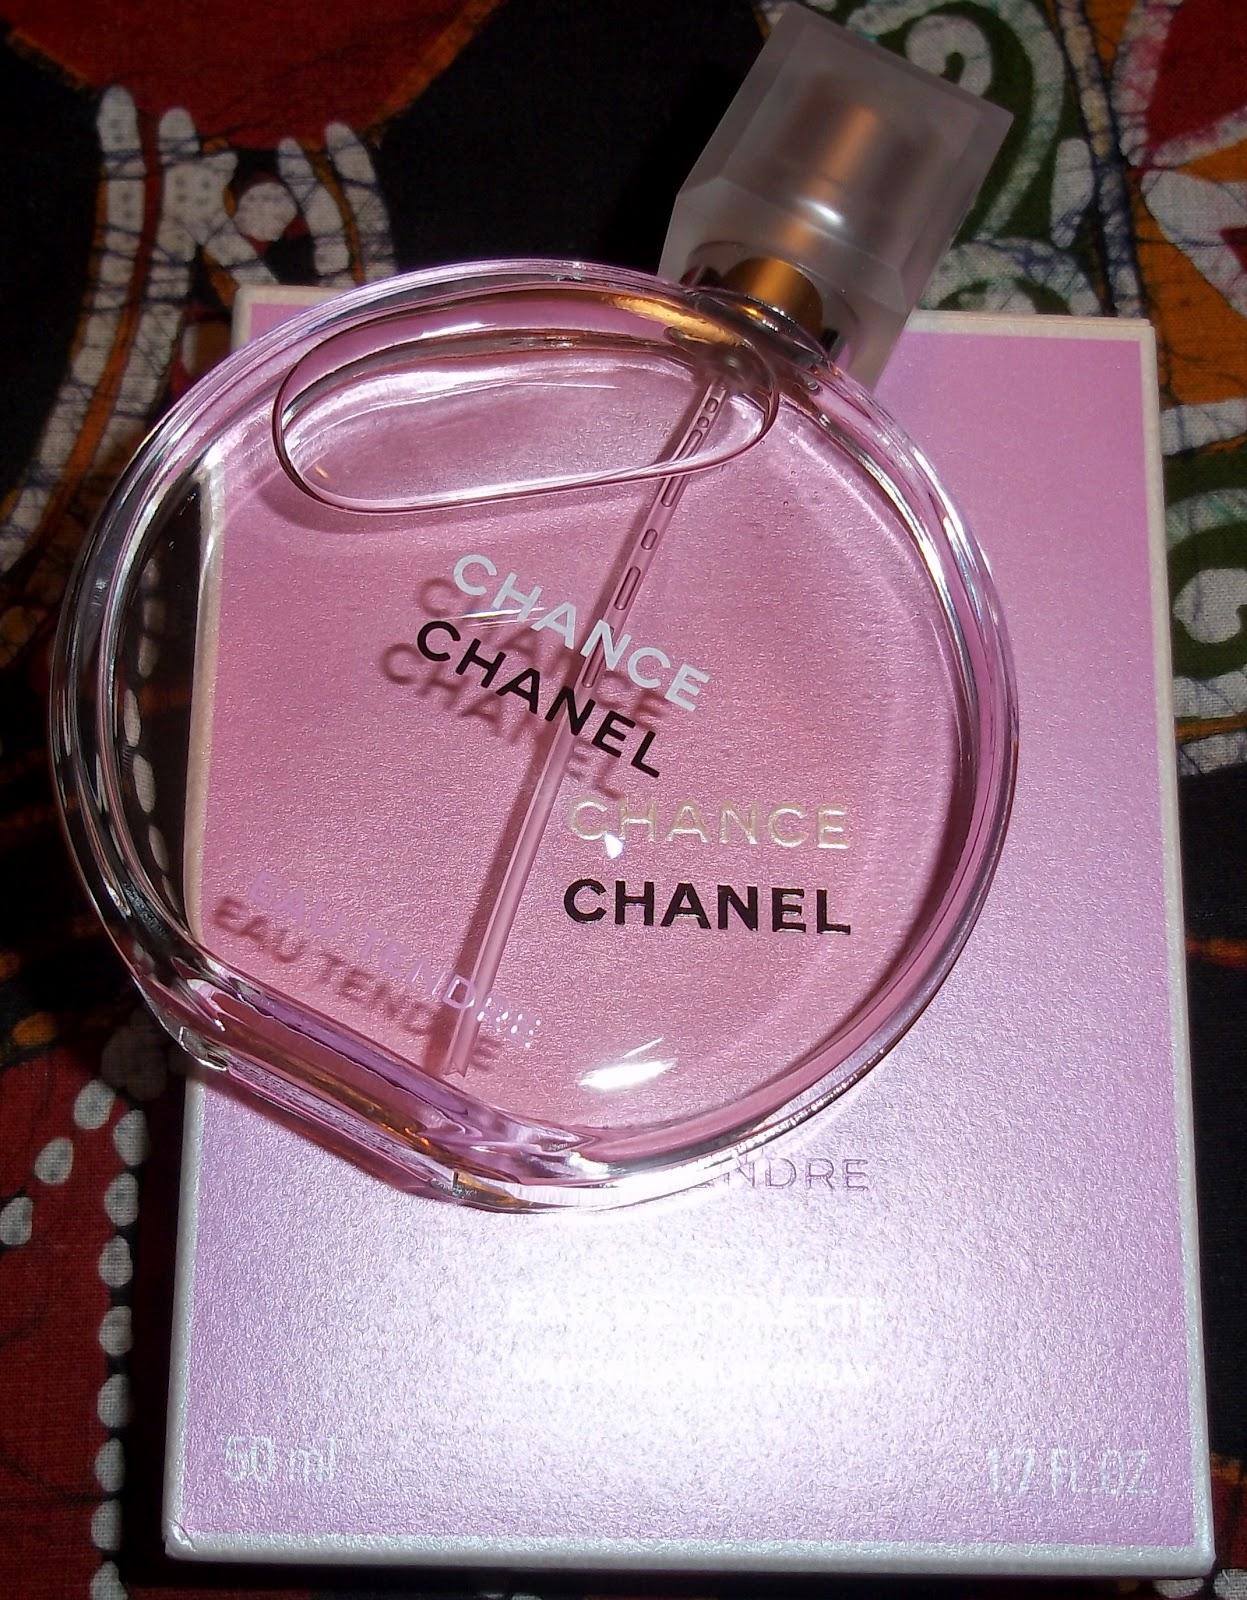 chanel chance eau tendre fragrance review beauty the scientist. Black Bedroom Furniture Sets. Home Design Ideas